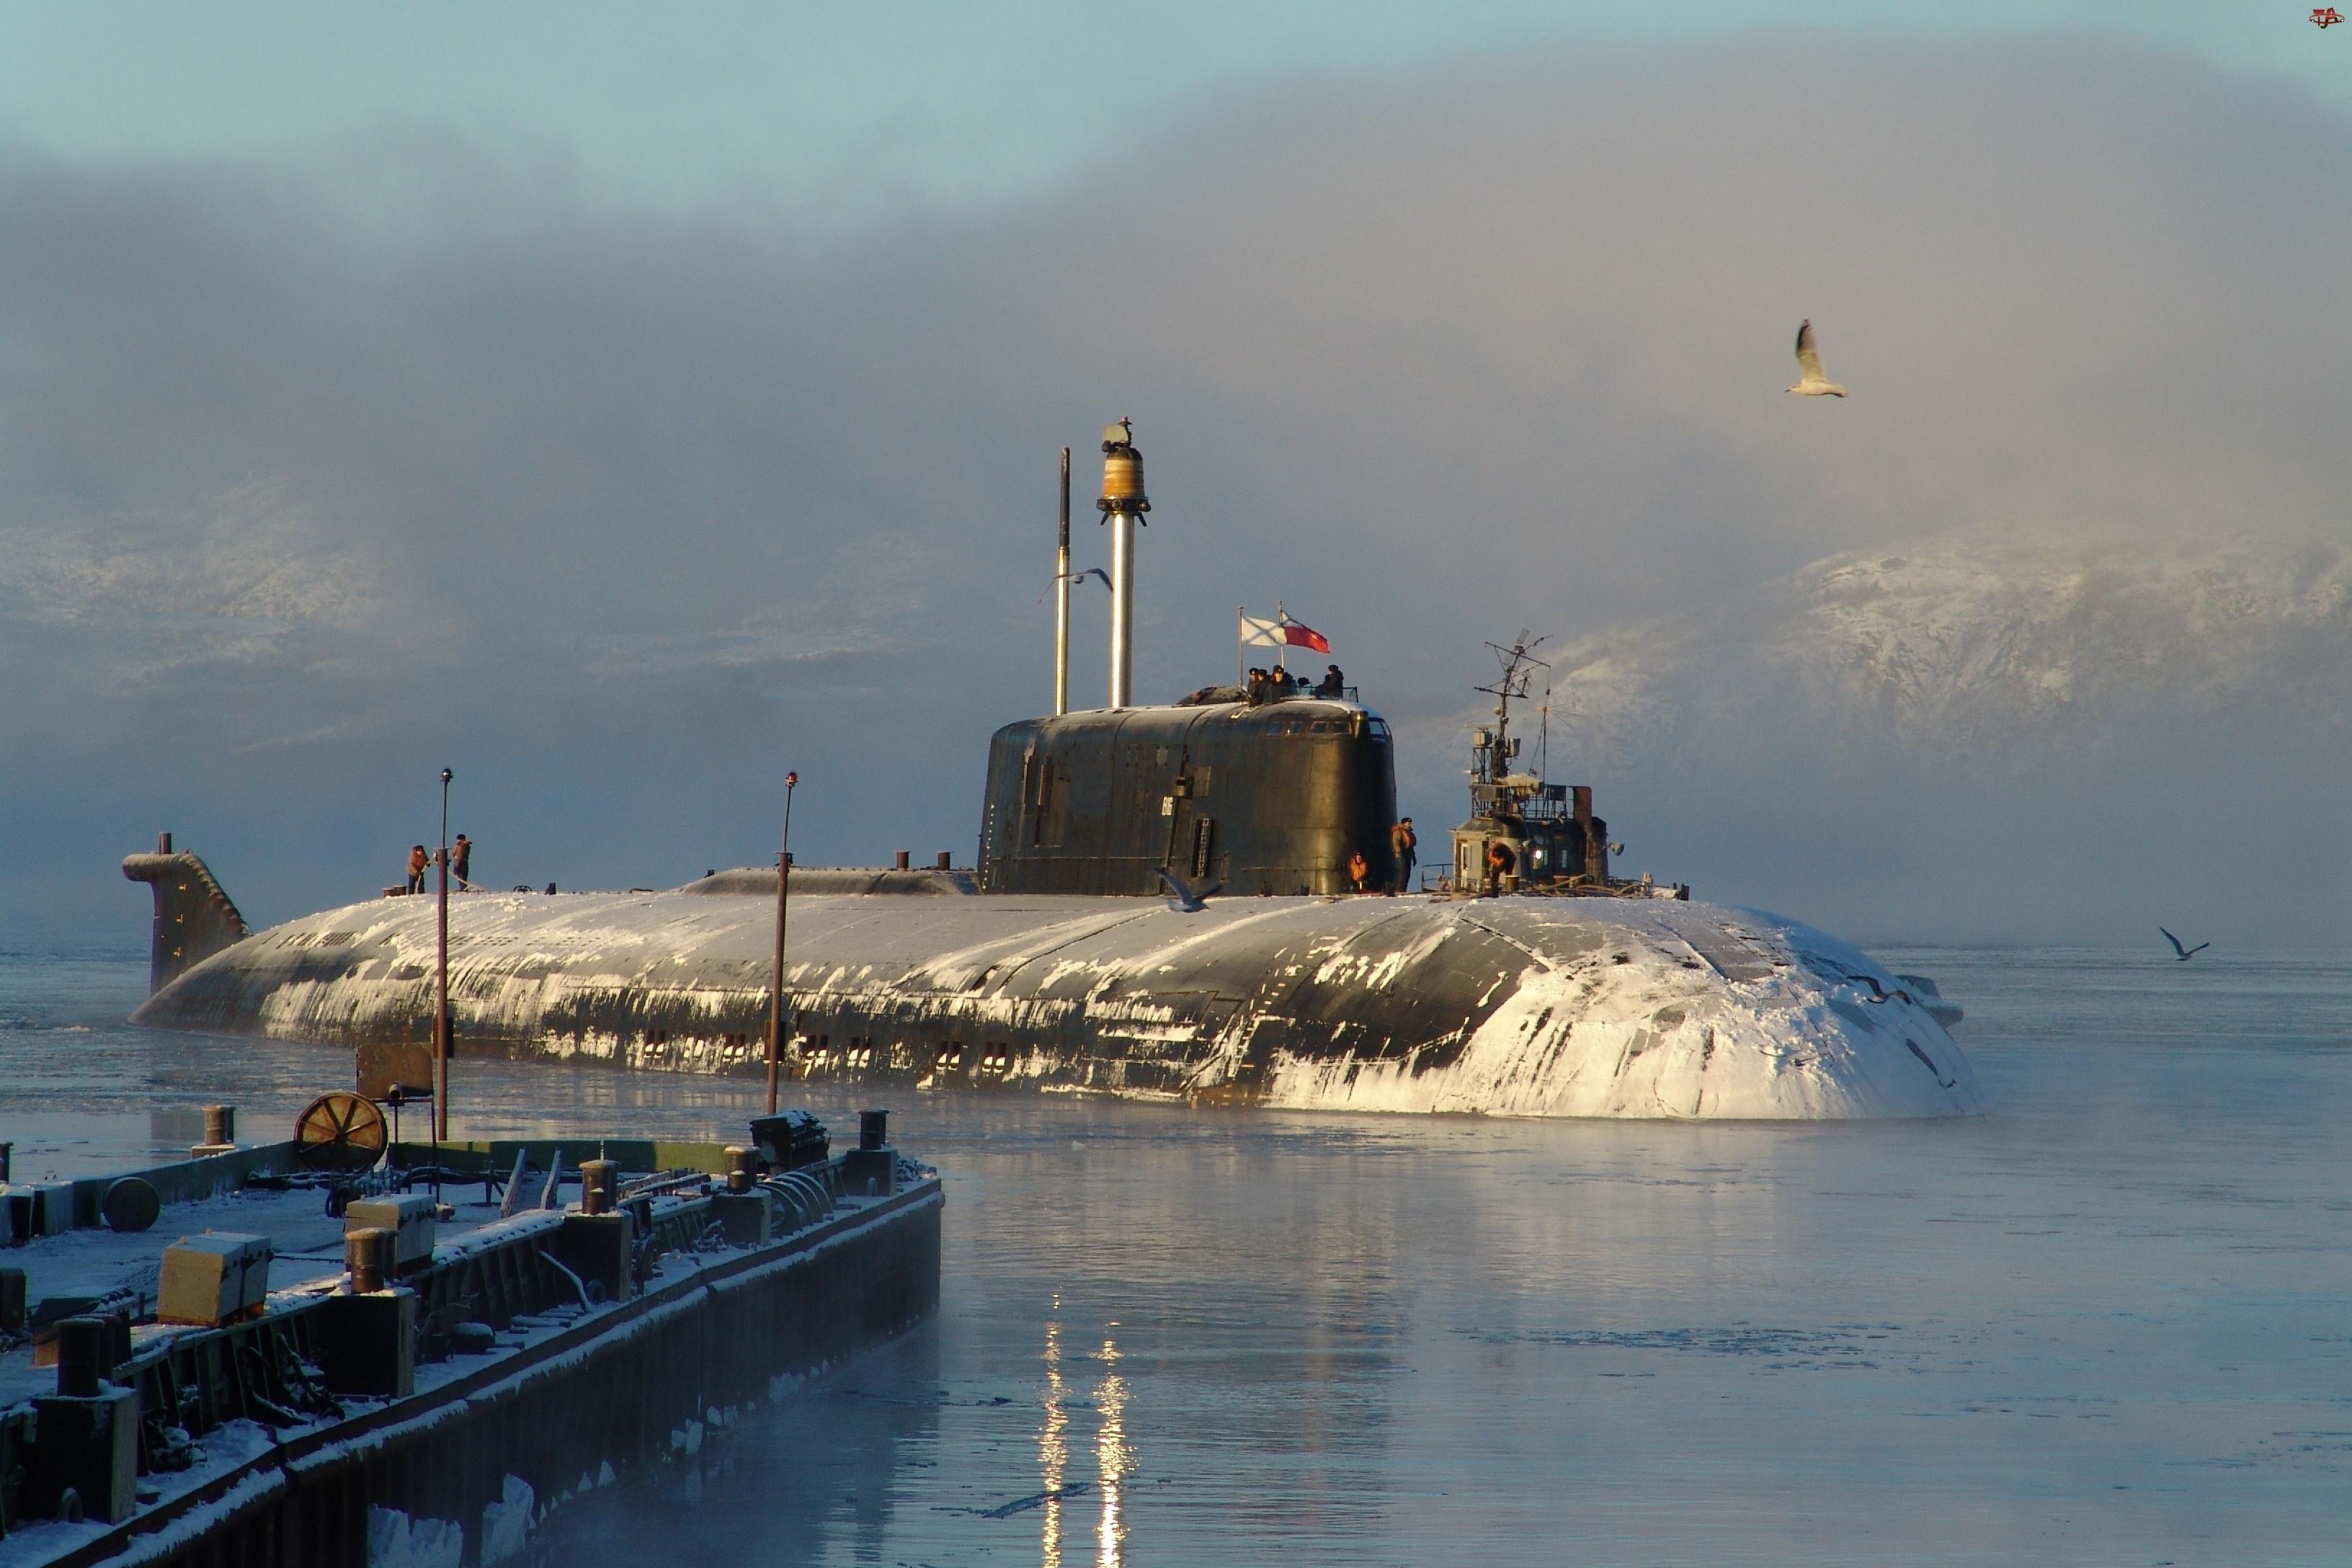 Podwodny, Zima, Okręt